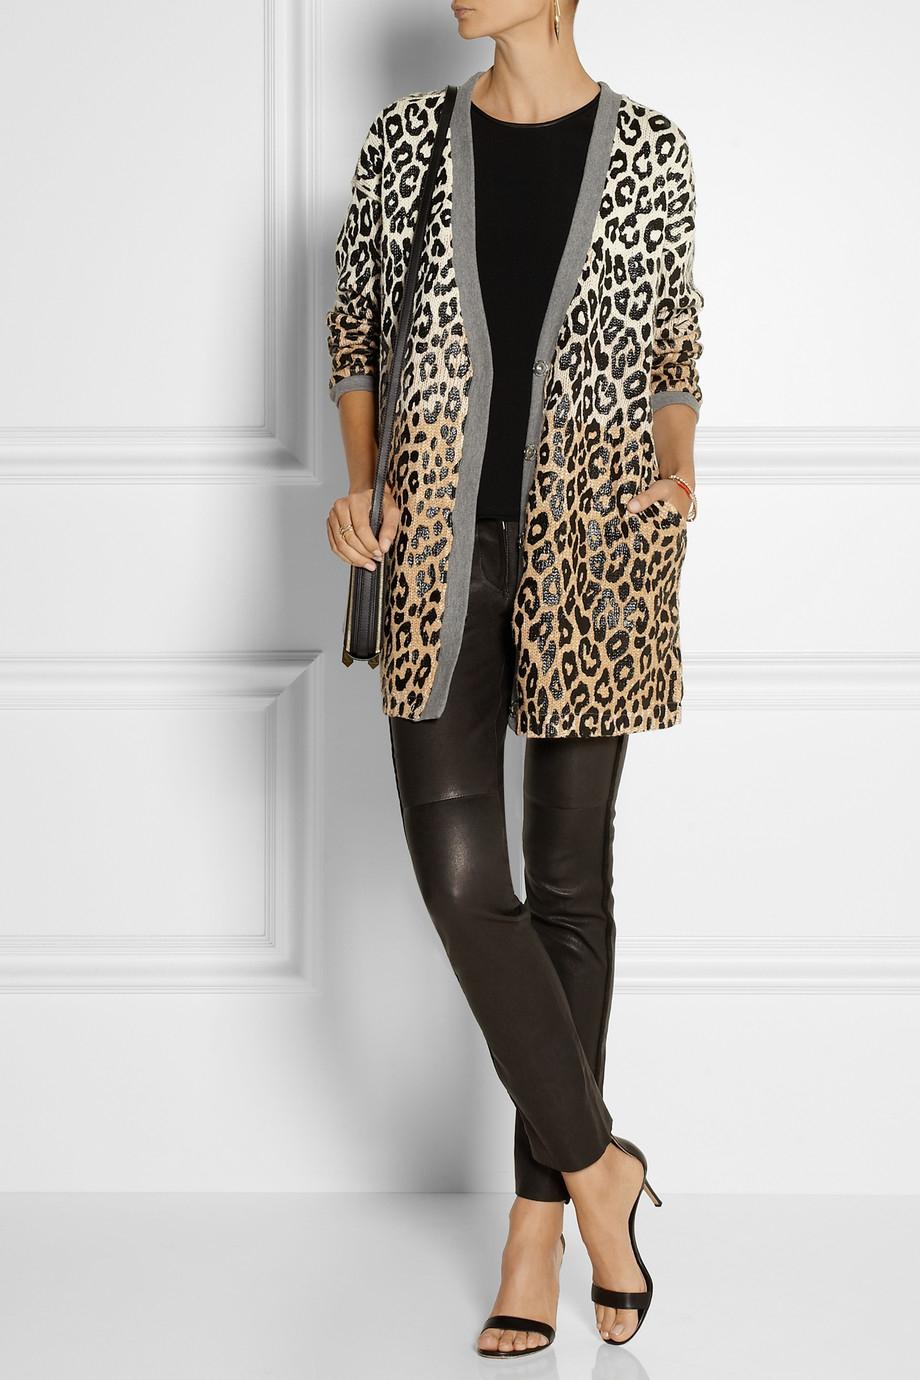 Elizabeth and james Leopard-print Cotton-blend Cardigan | Lyst